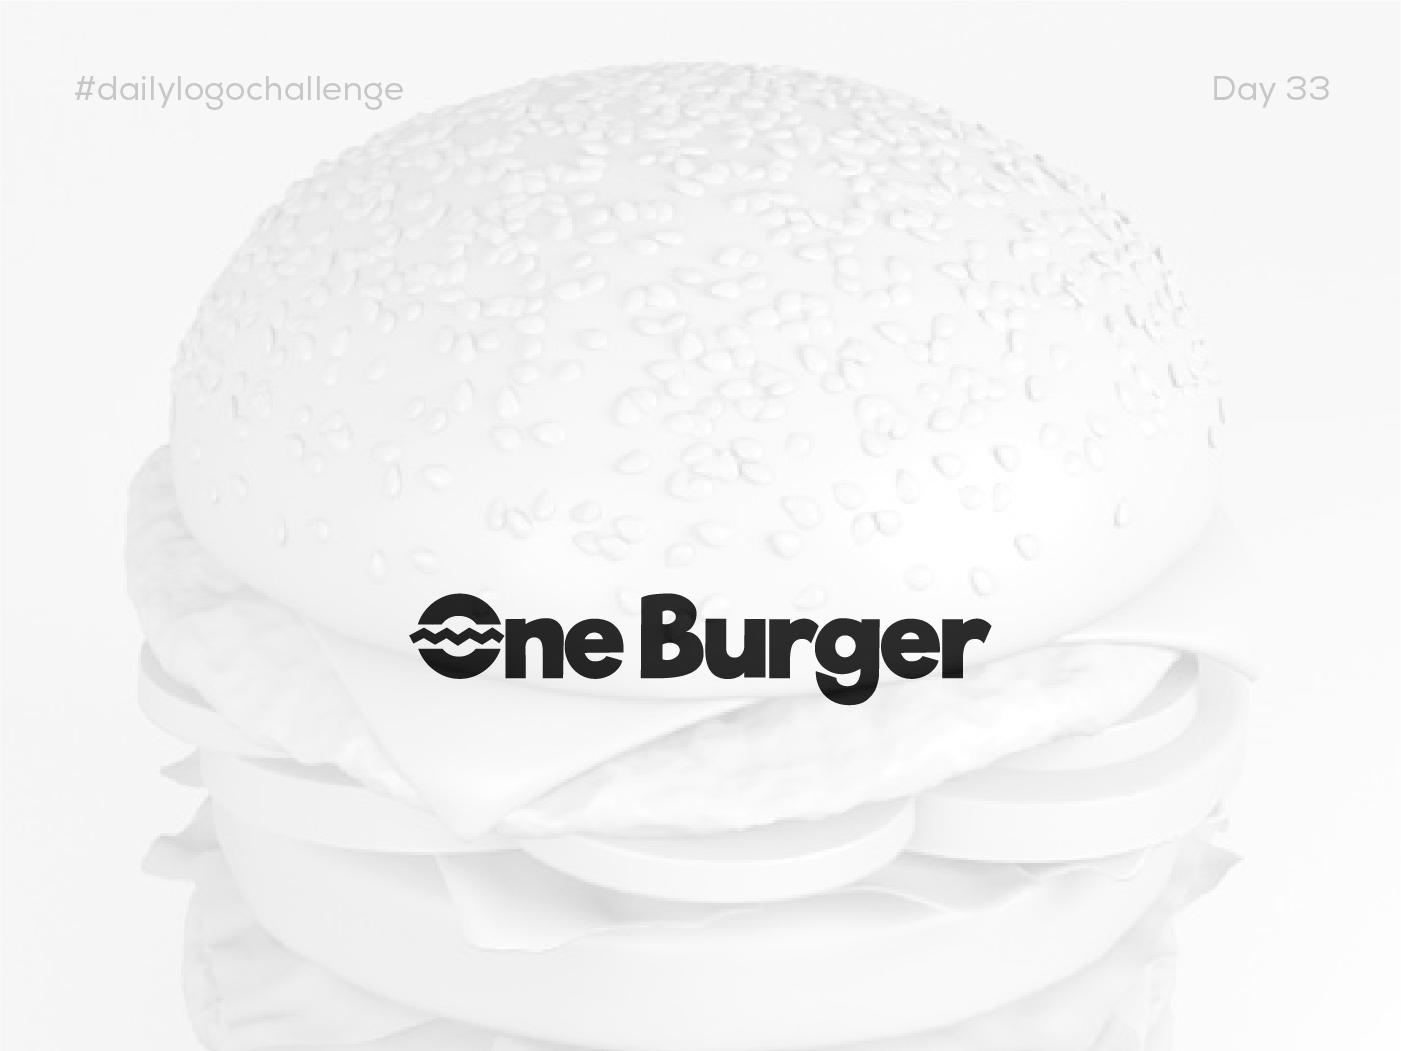 Dailychallenge Insta Shots Pt4 03 joints burger logo logo vector typography design mirasadesign mirasa